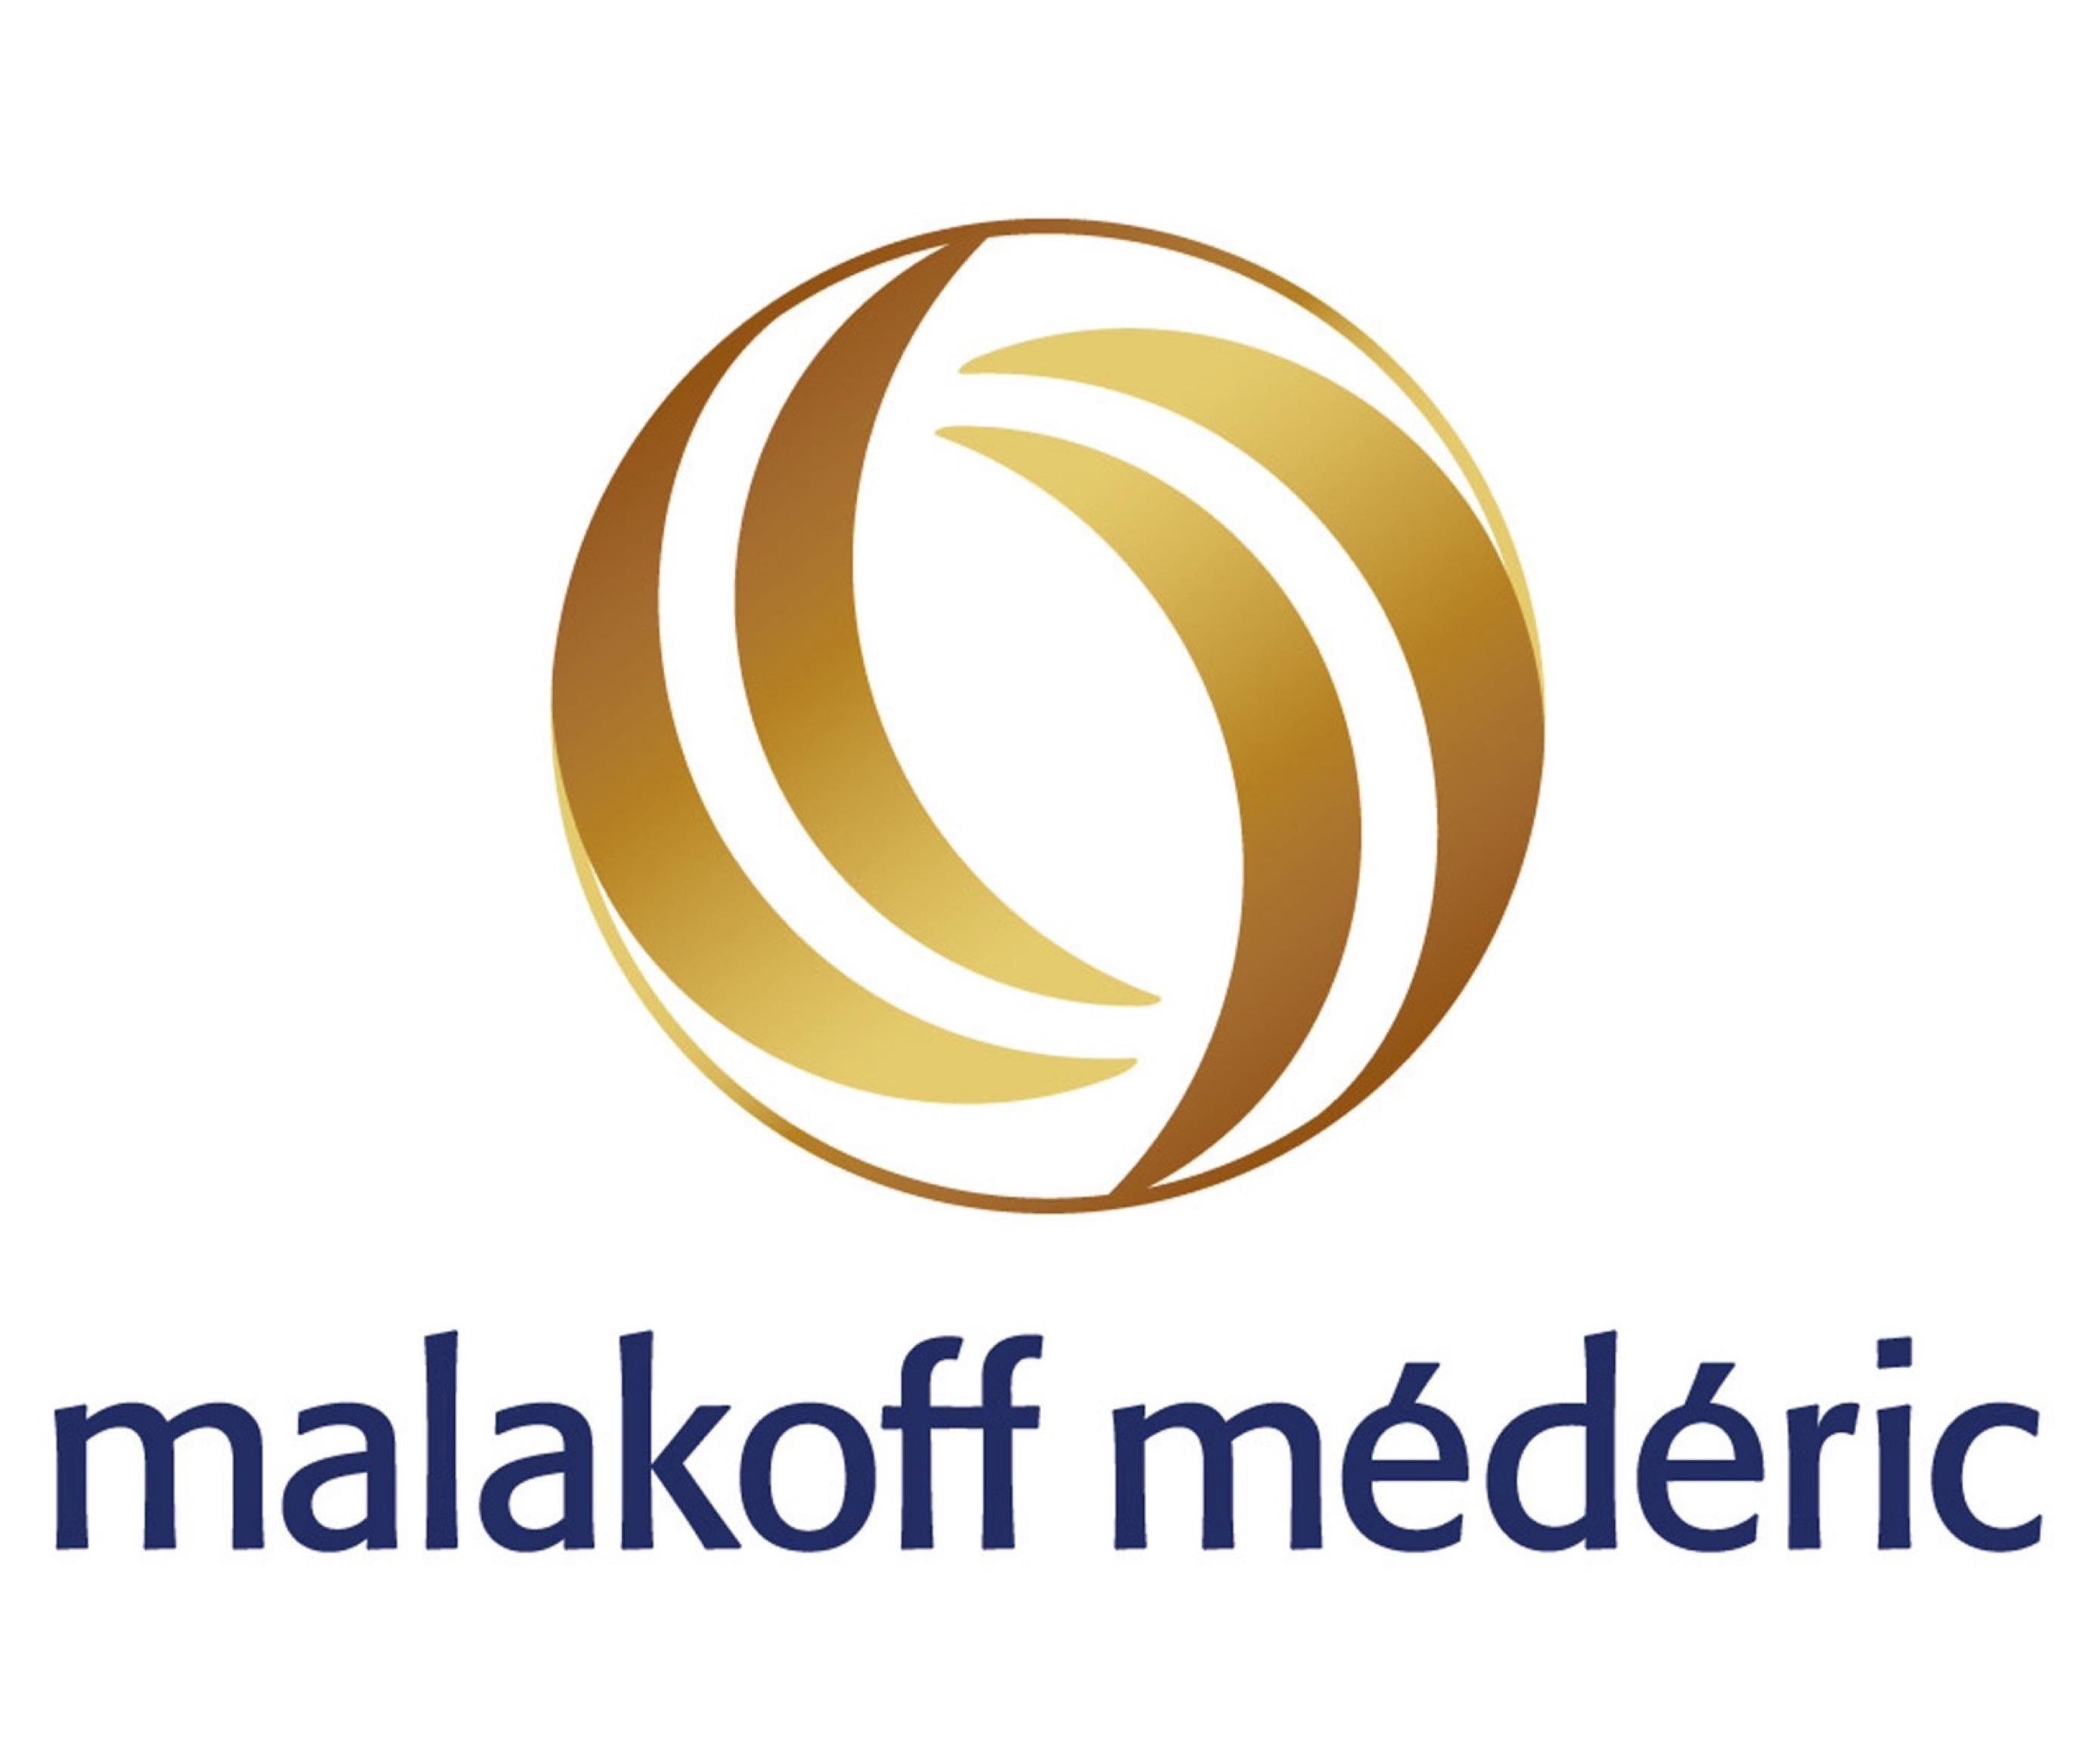 L'association Apte fête, en 2016, ses 10 ans avec Malakoff Médéric